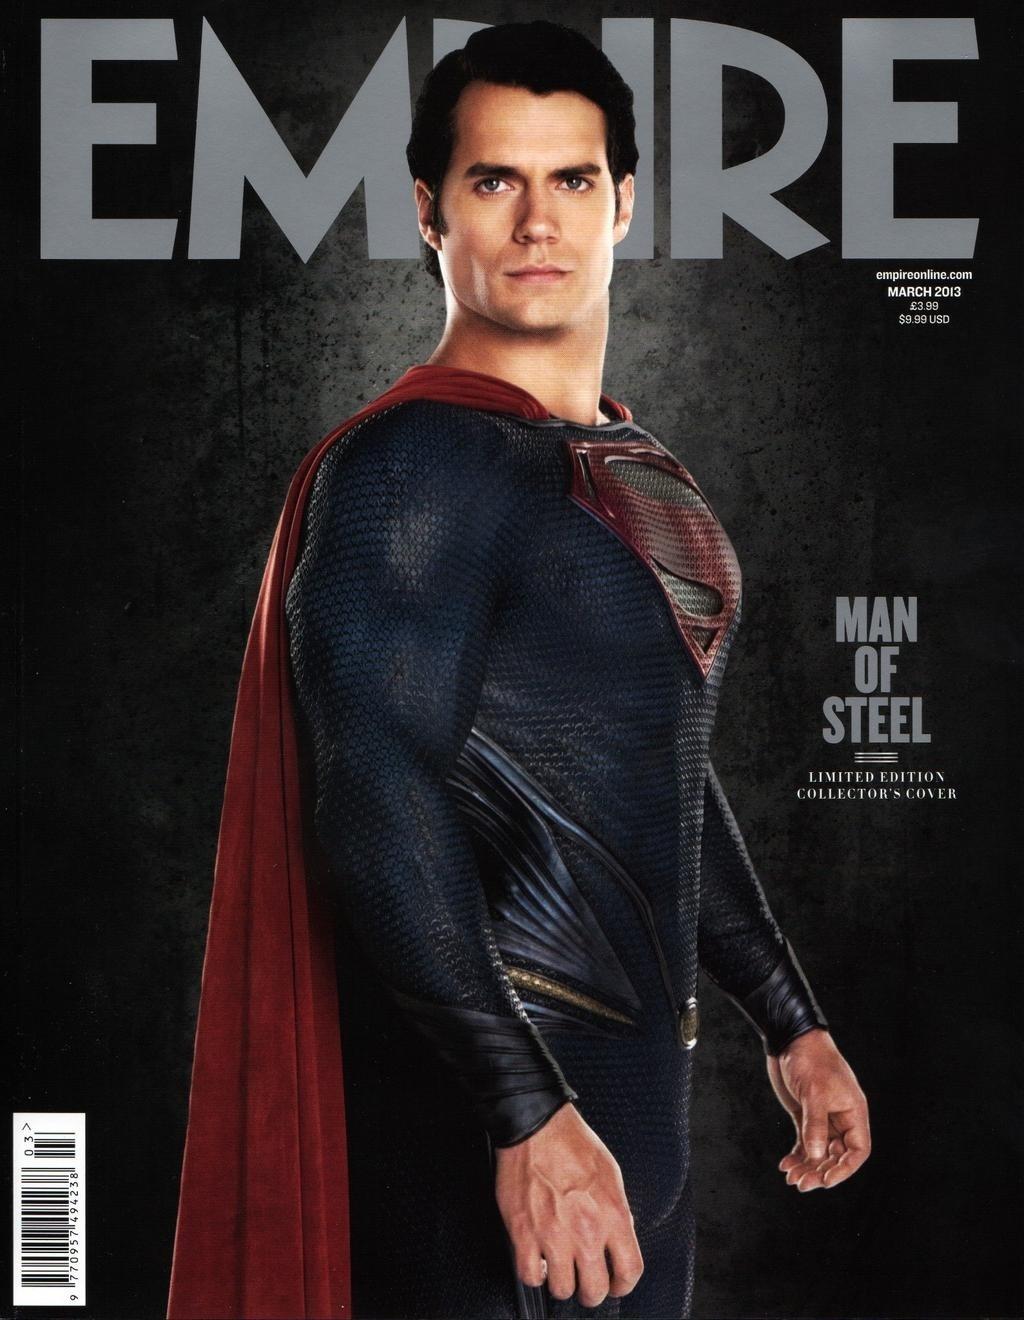 http://2.bp.blogspot.com/-GP24y7VjjDw/UW4OsszumdI/AAAAAAAARZo/vSf5pnypmUg/s1600/man+of+steel+superman+henry+cavill+empire.jpg